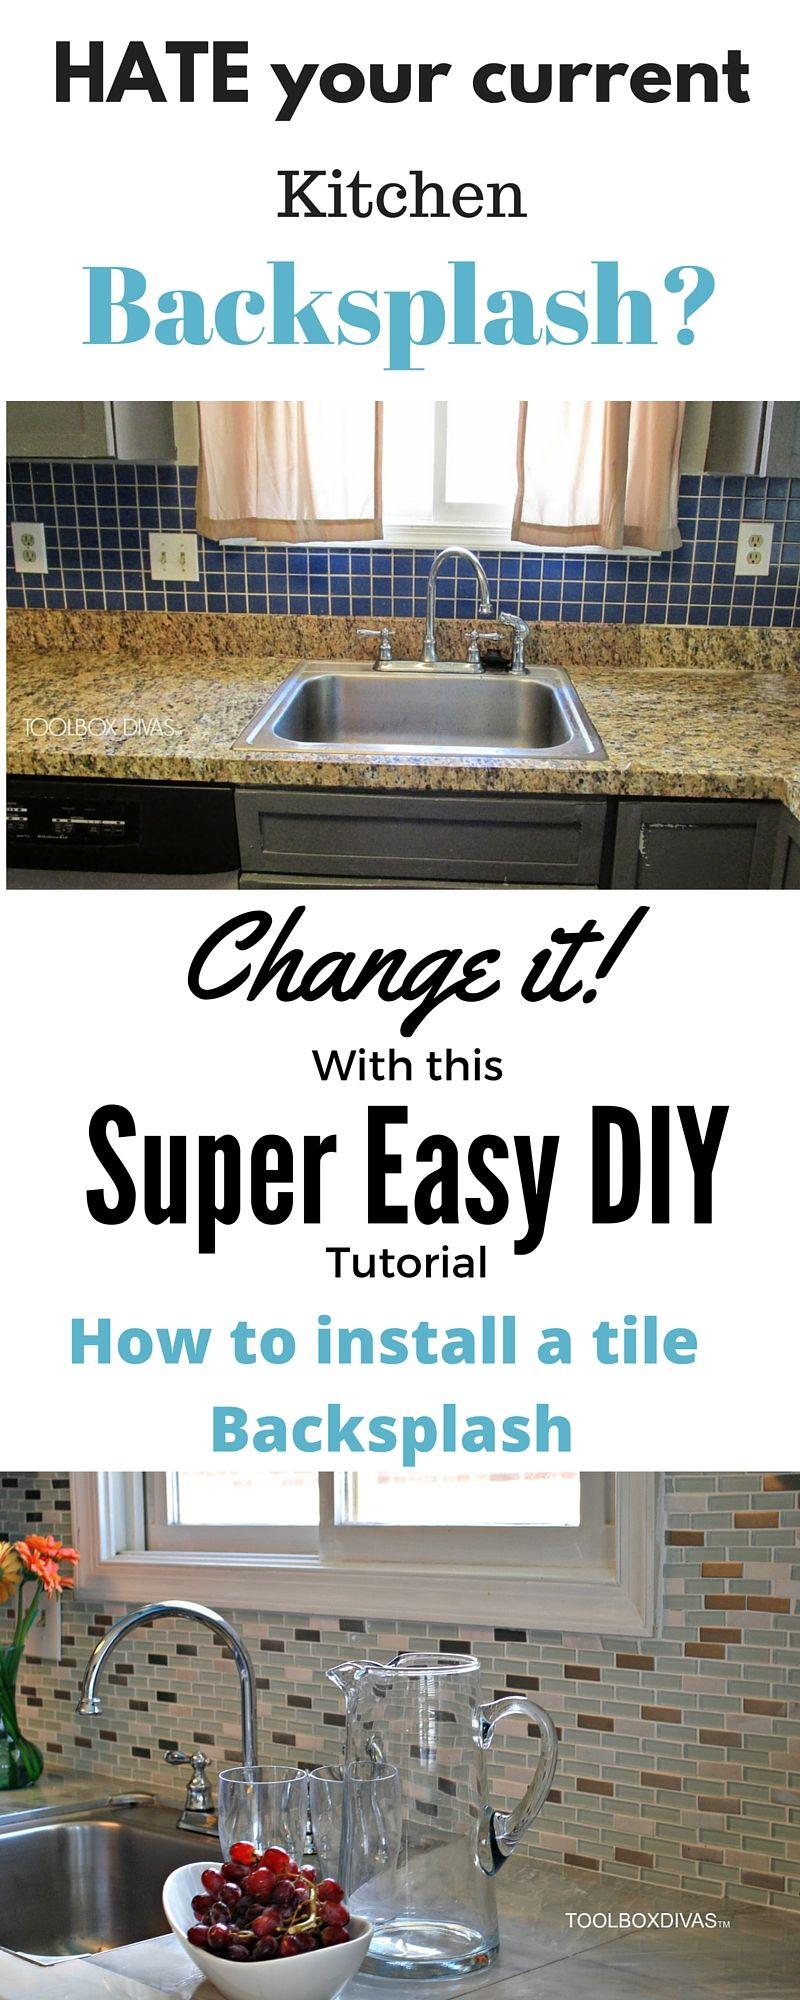 How To Install A Kitchen Tile Backsplash The Easy Way Diy Backsplash Tile Removal Diy Wainscoting